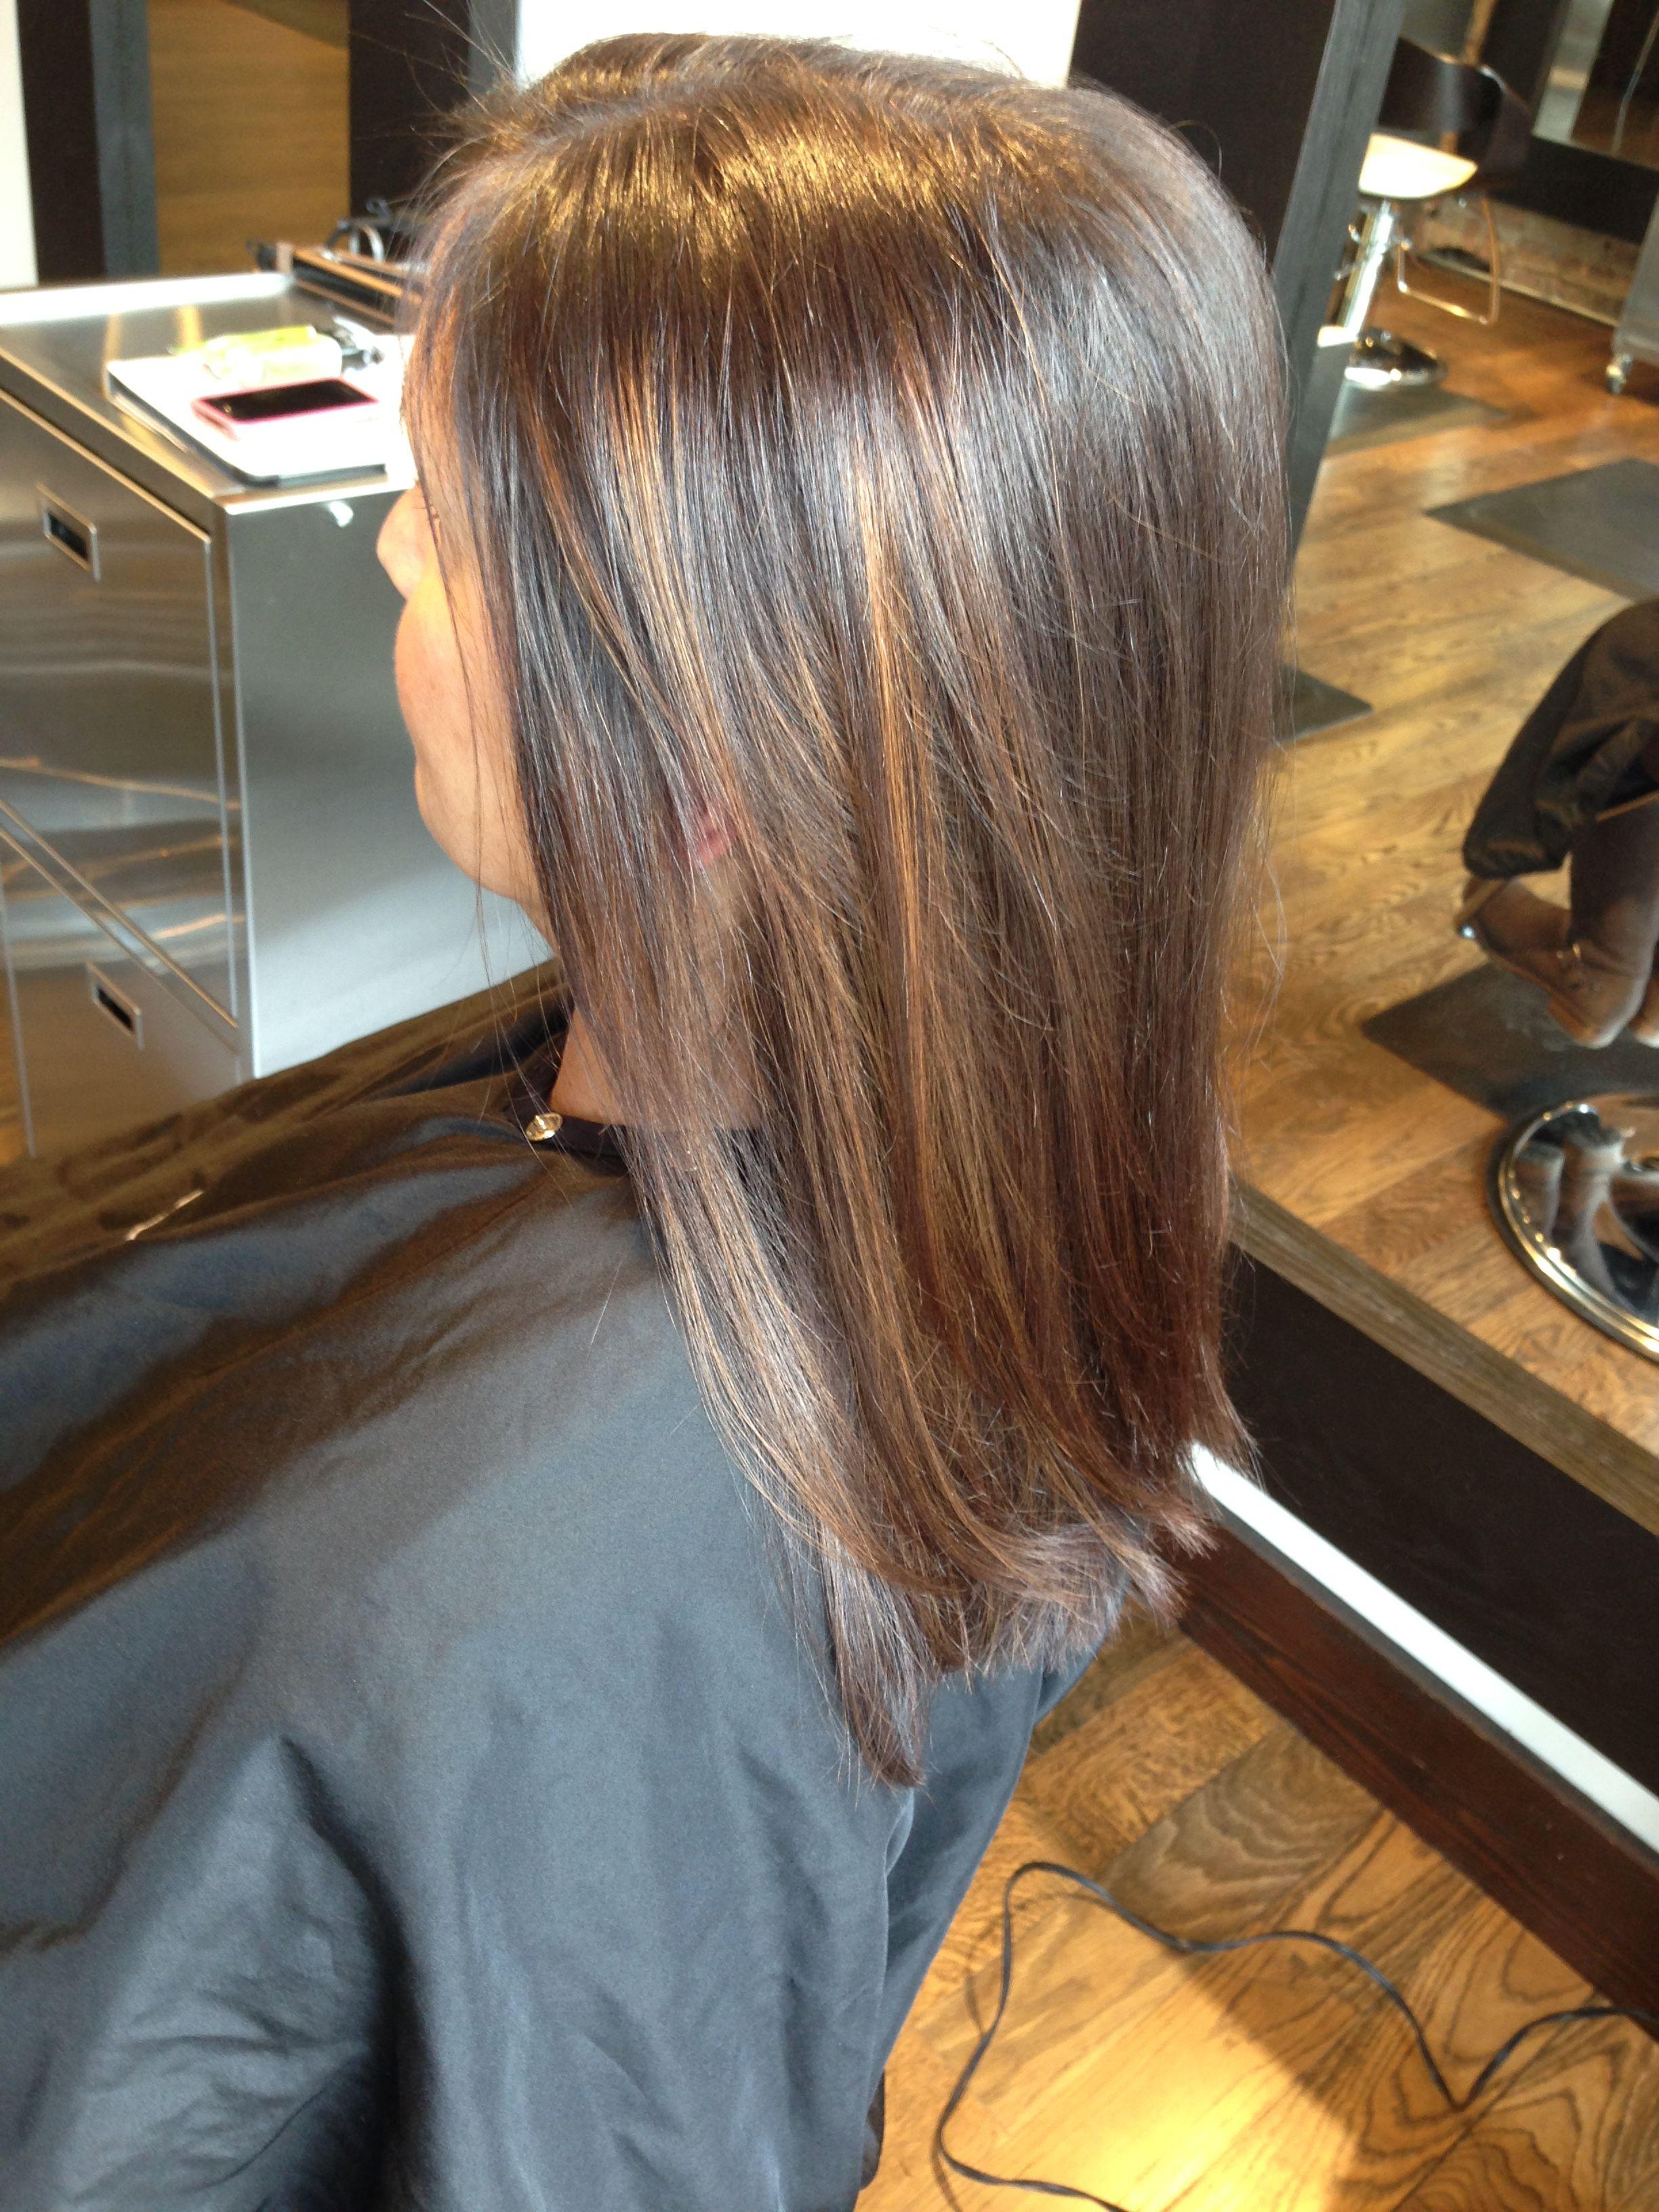 Subtle Highlights And Haircut By Amy Roman Namaste Salon Wheaton